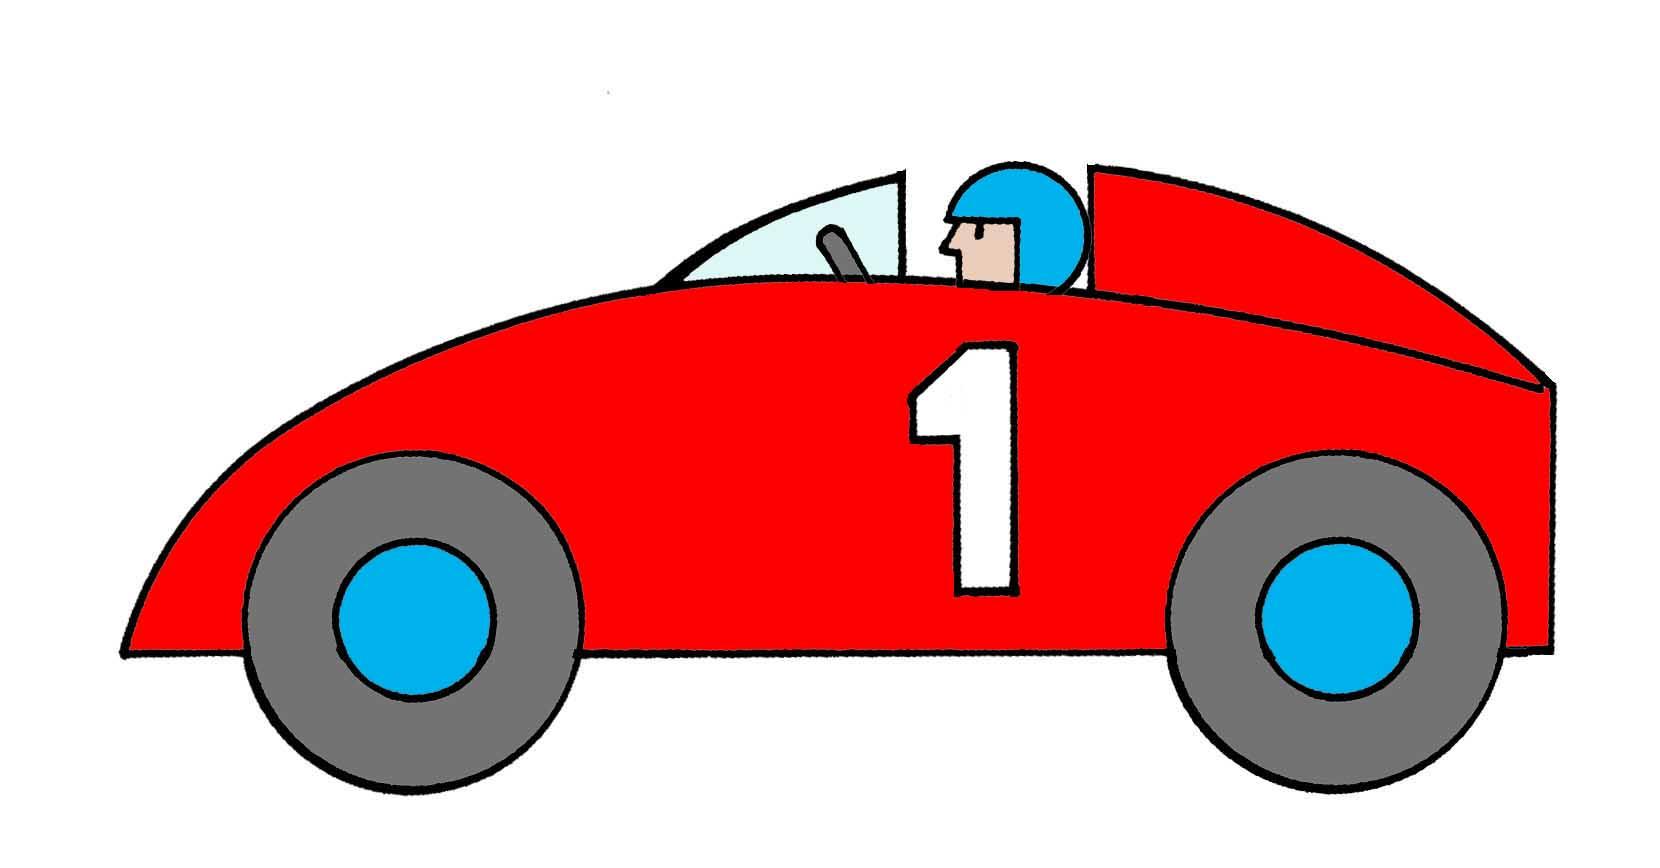 Cartoon Race Car Stock Images RoyaltyFree Images